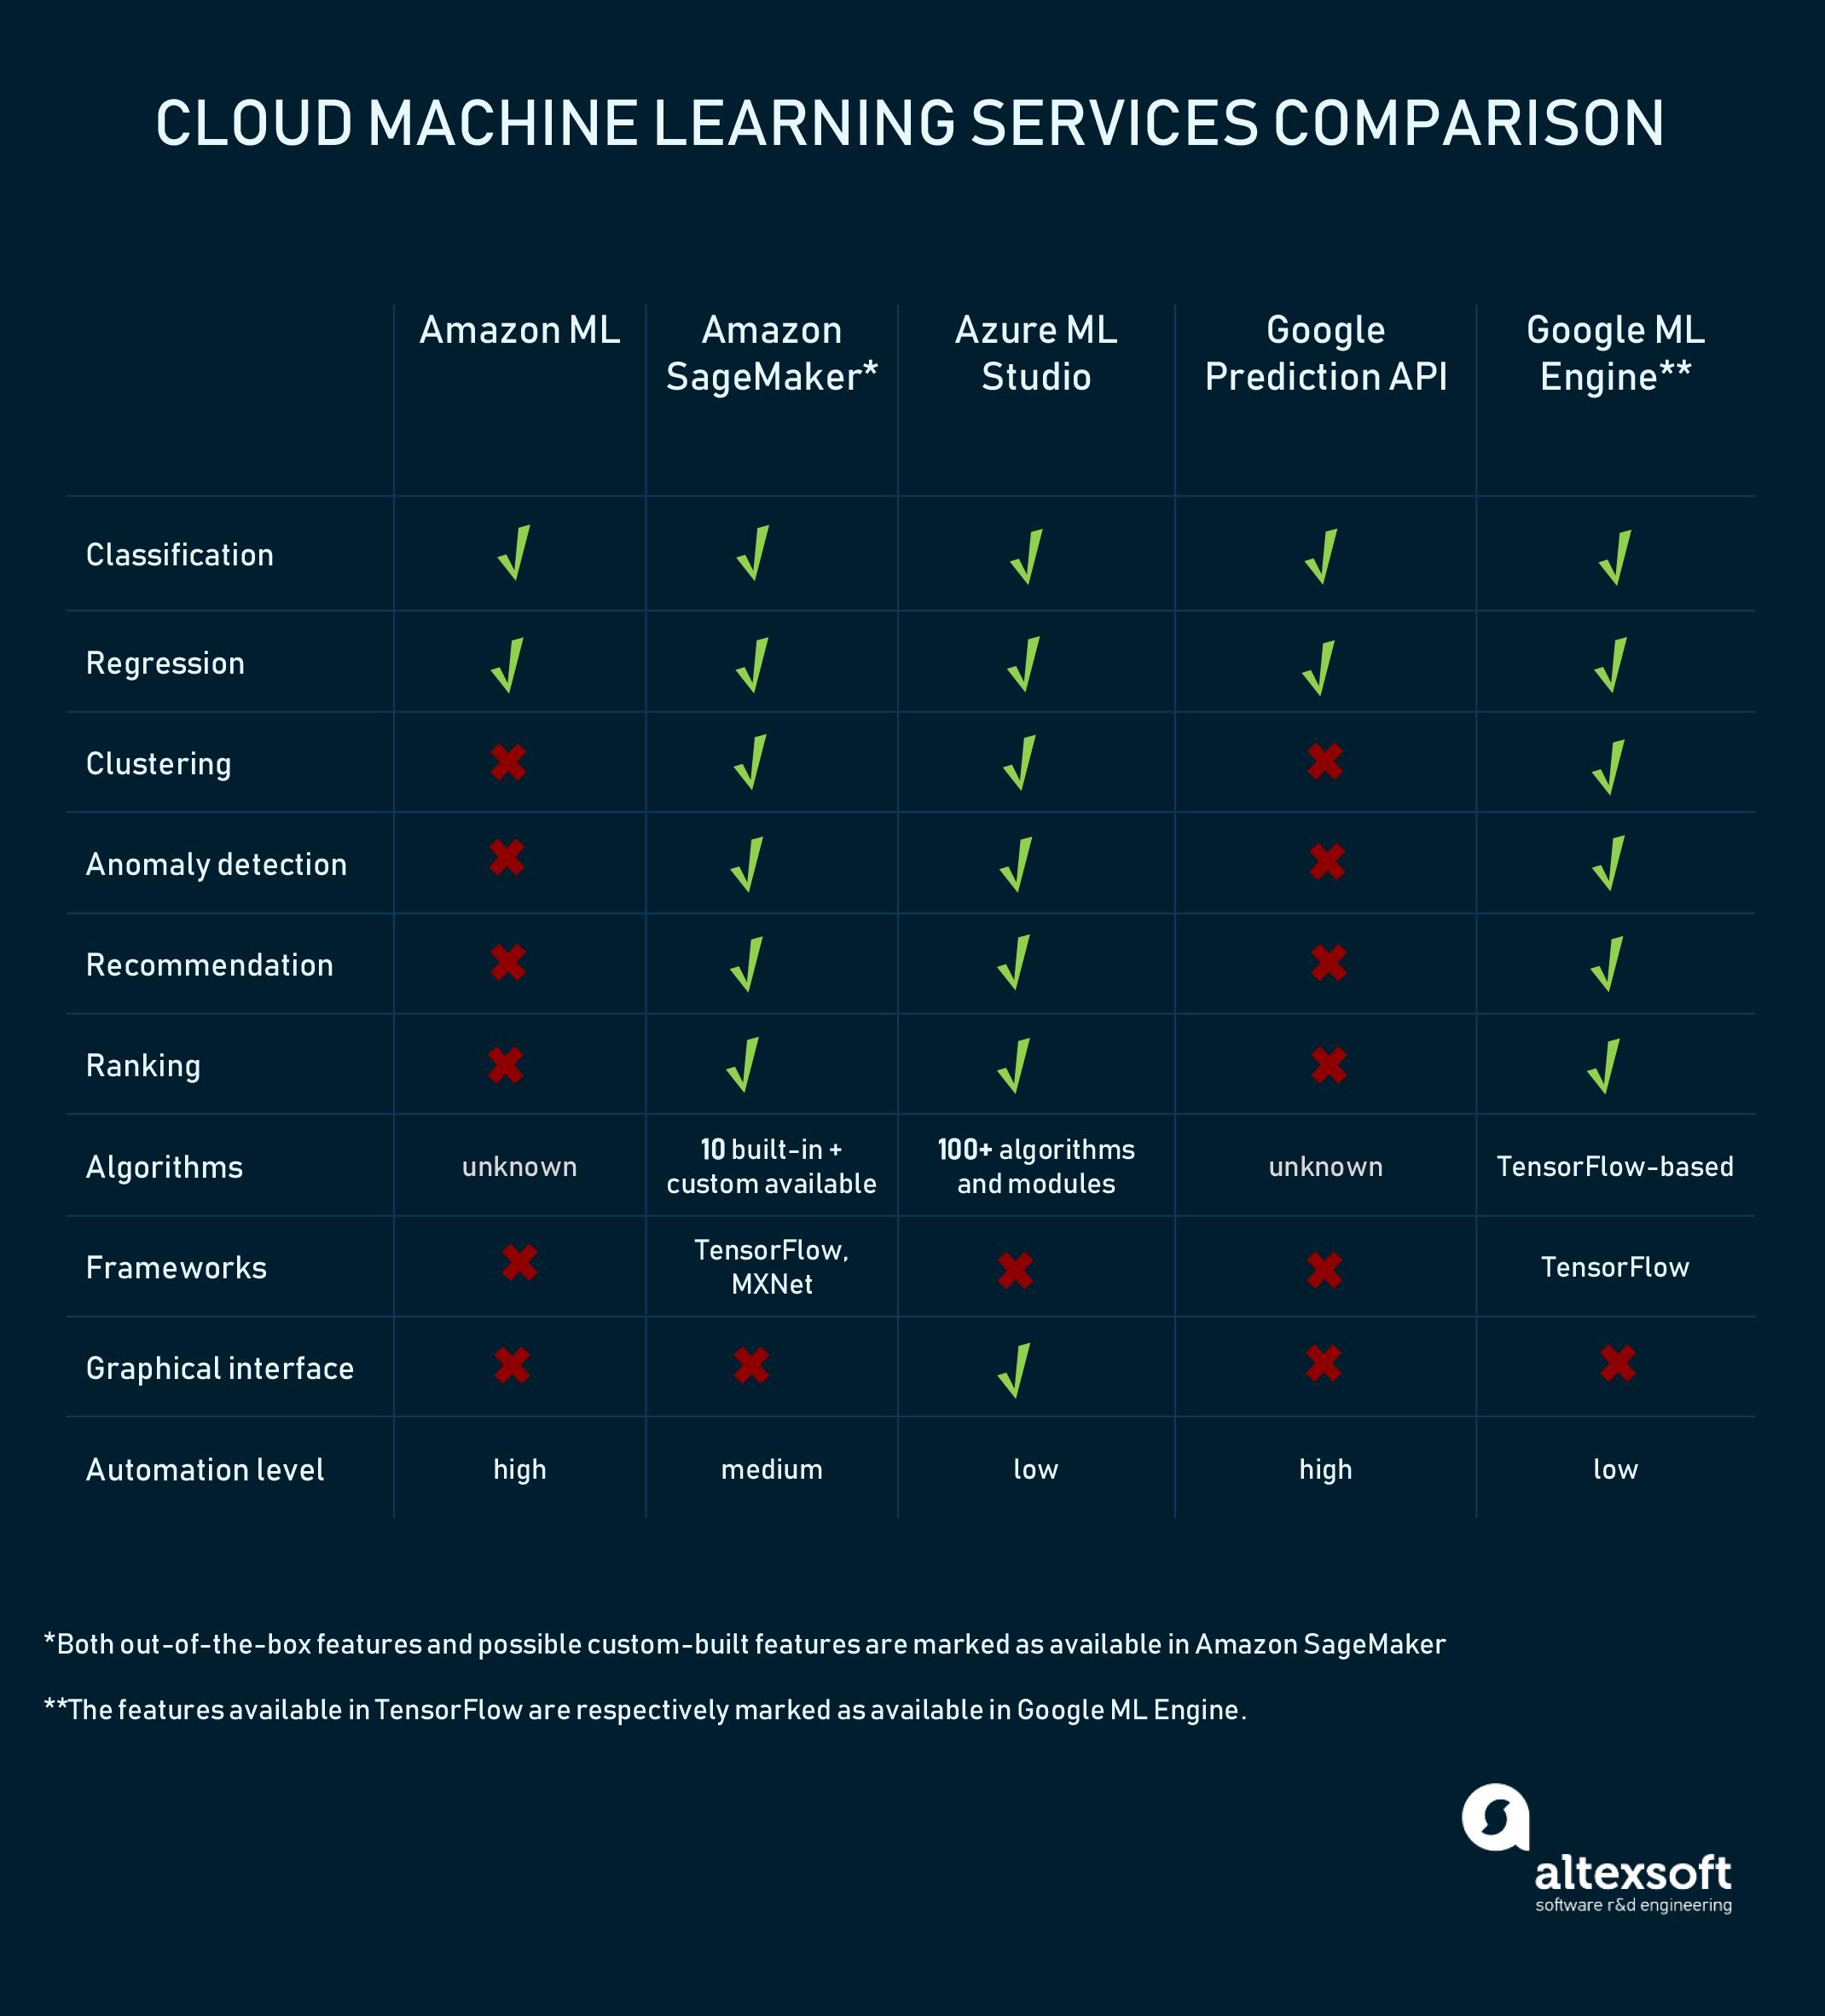 Amazon-Azure-Google-Cloud-Machine-Learning-Comparison